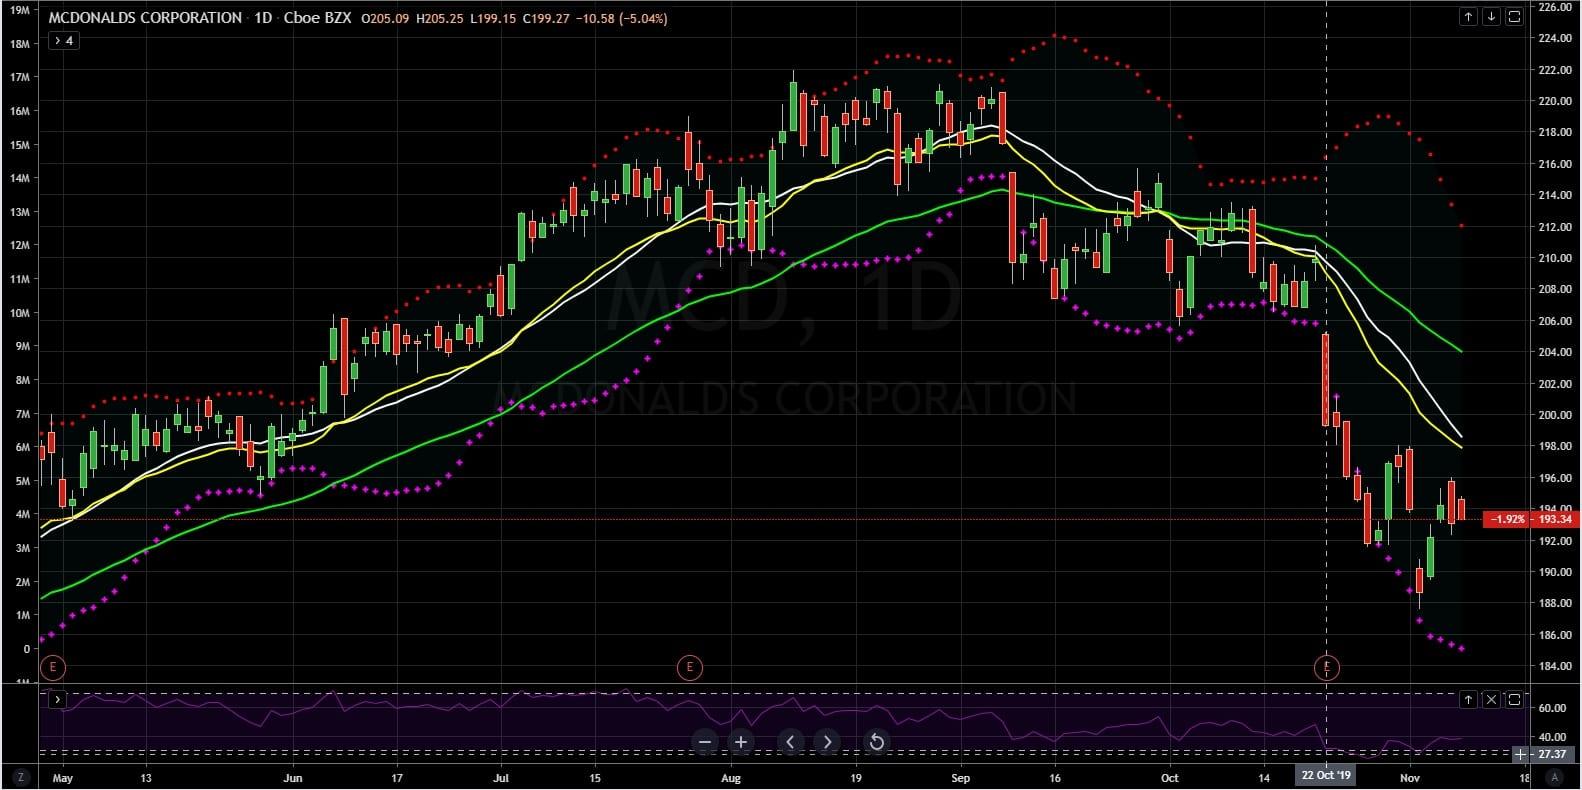 McDonald Stock Daily Chart